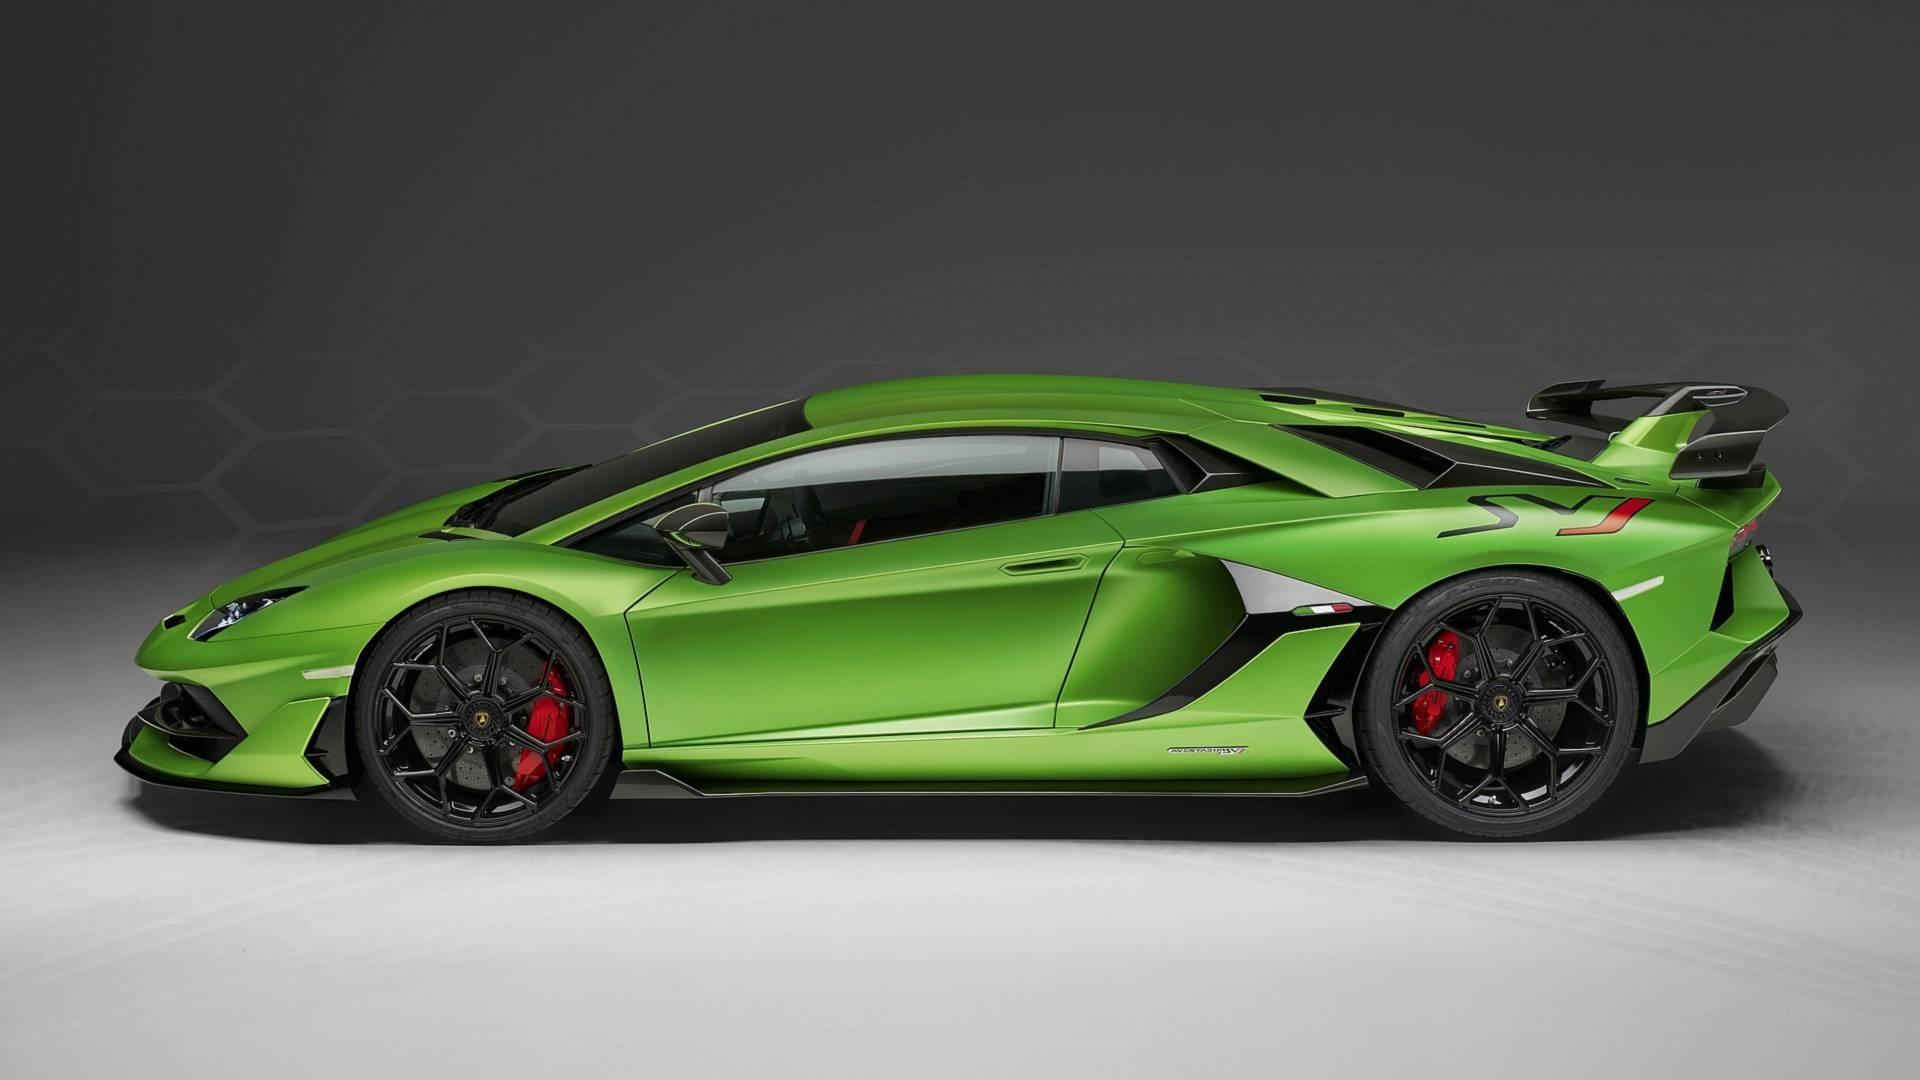 2019 Lamborghini Aventador Svj Revealed Priced At